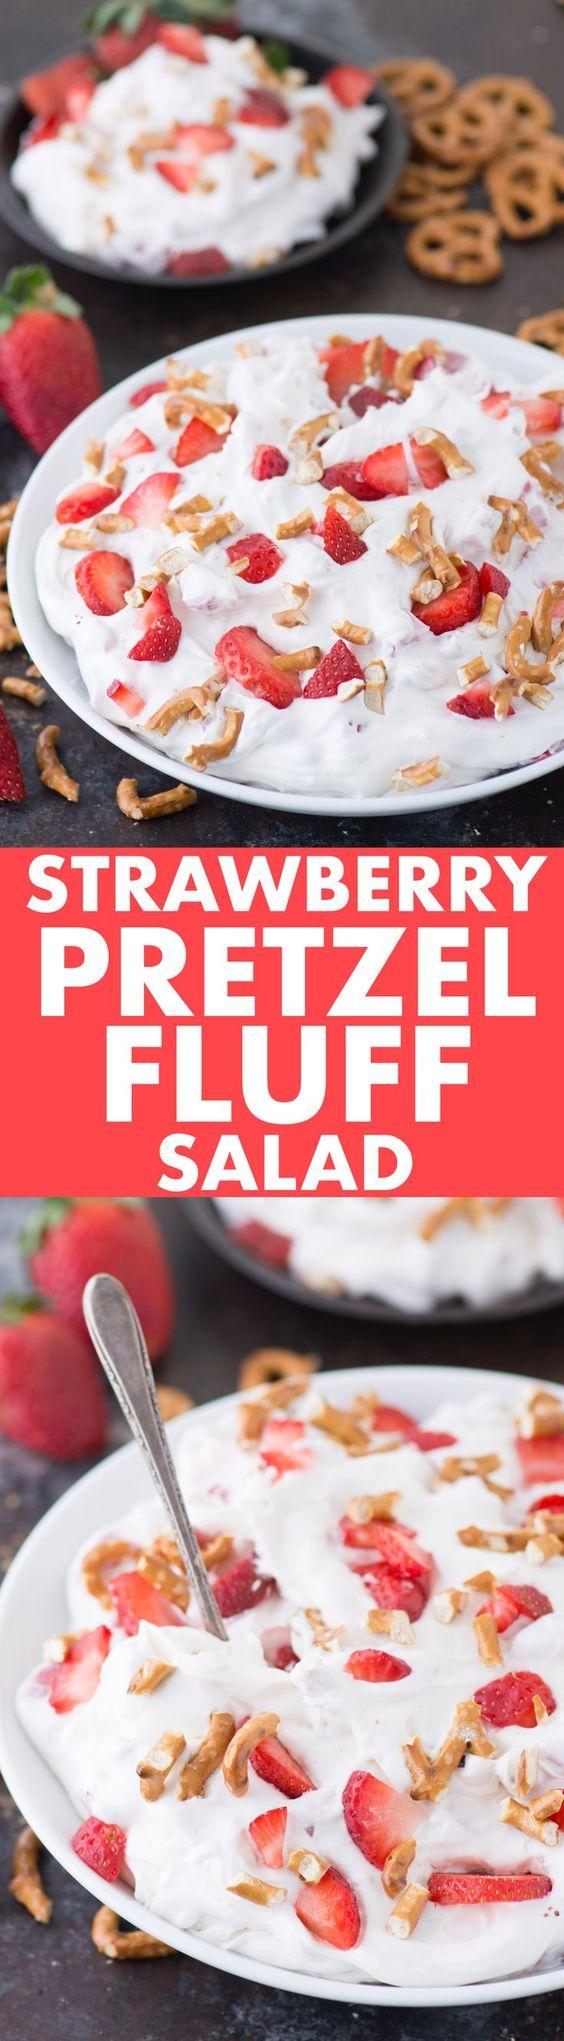 STRAWBERRY PRETZEL FLUFF SALAD! A dessert salad that reminds us of the classic strawberry pretzel bar dessert. A picnic recipe you can make in 10 minutes!: